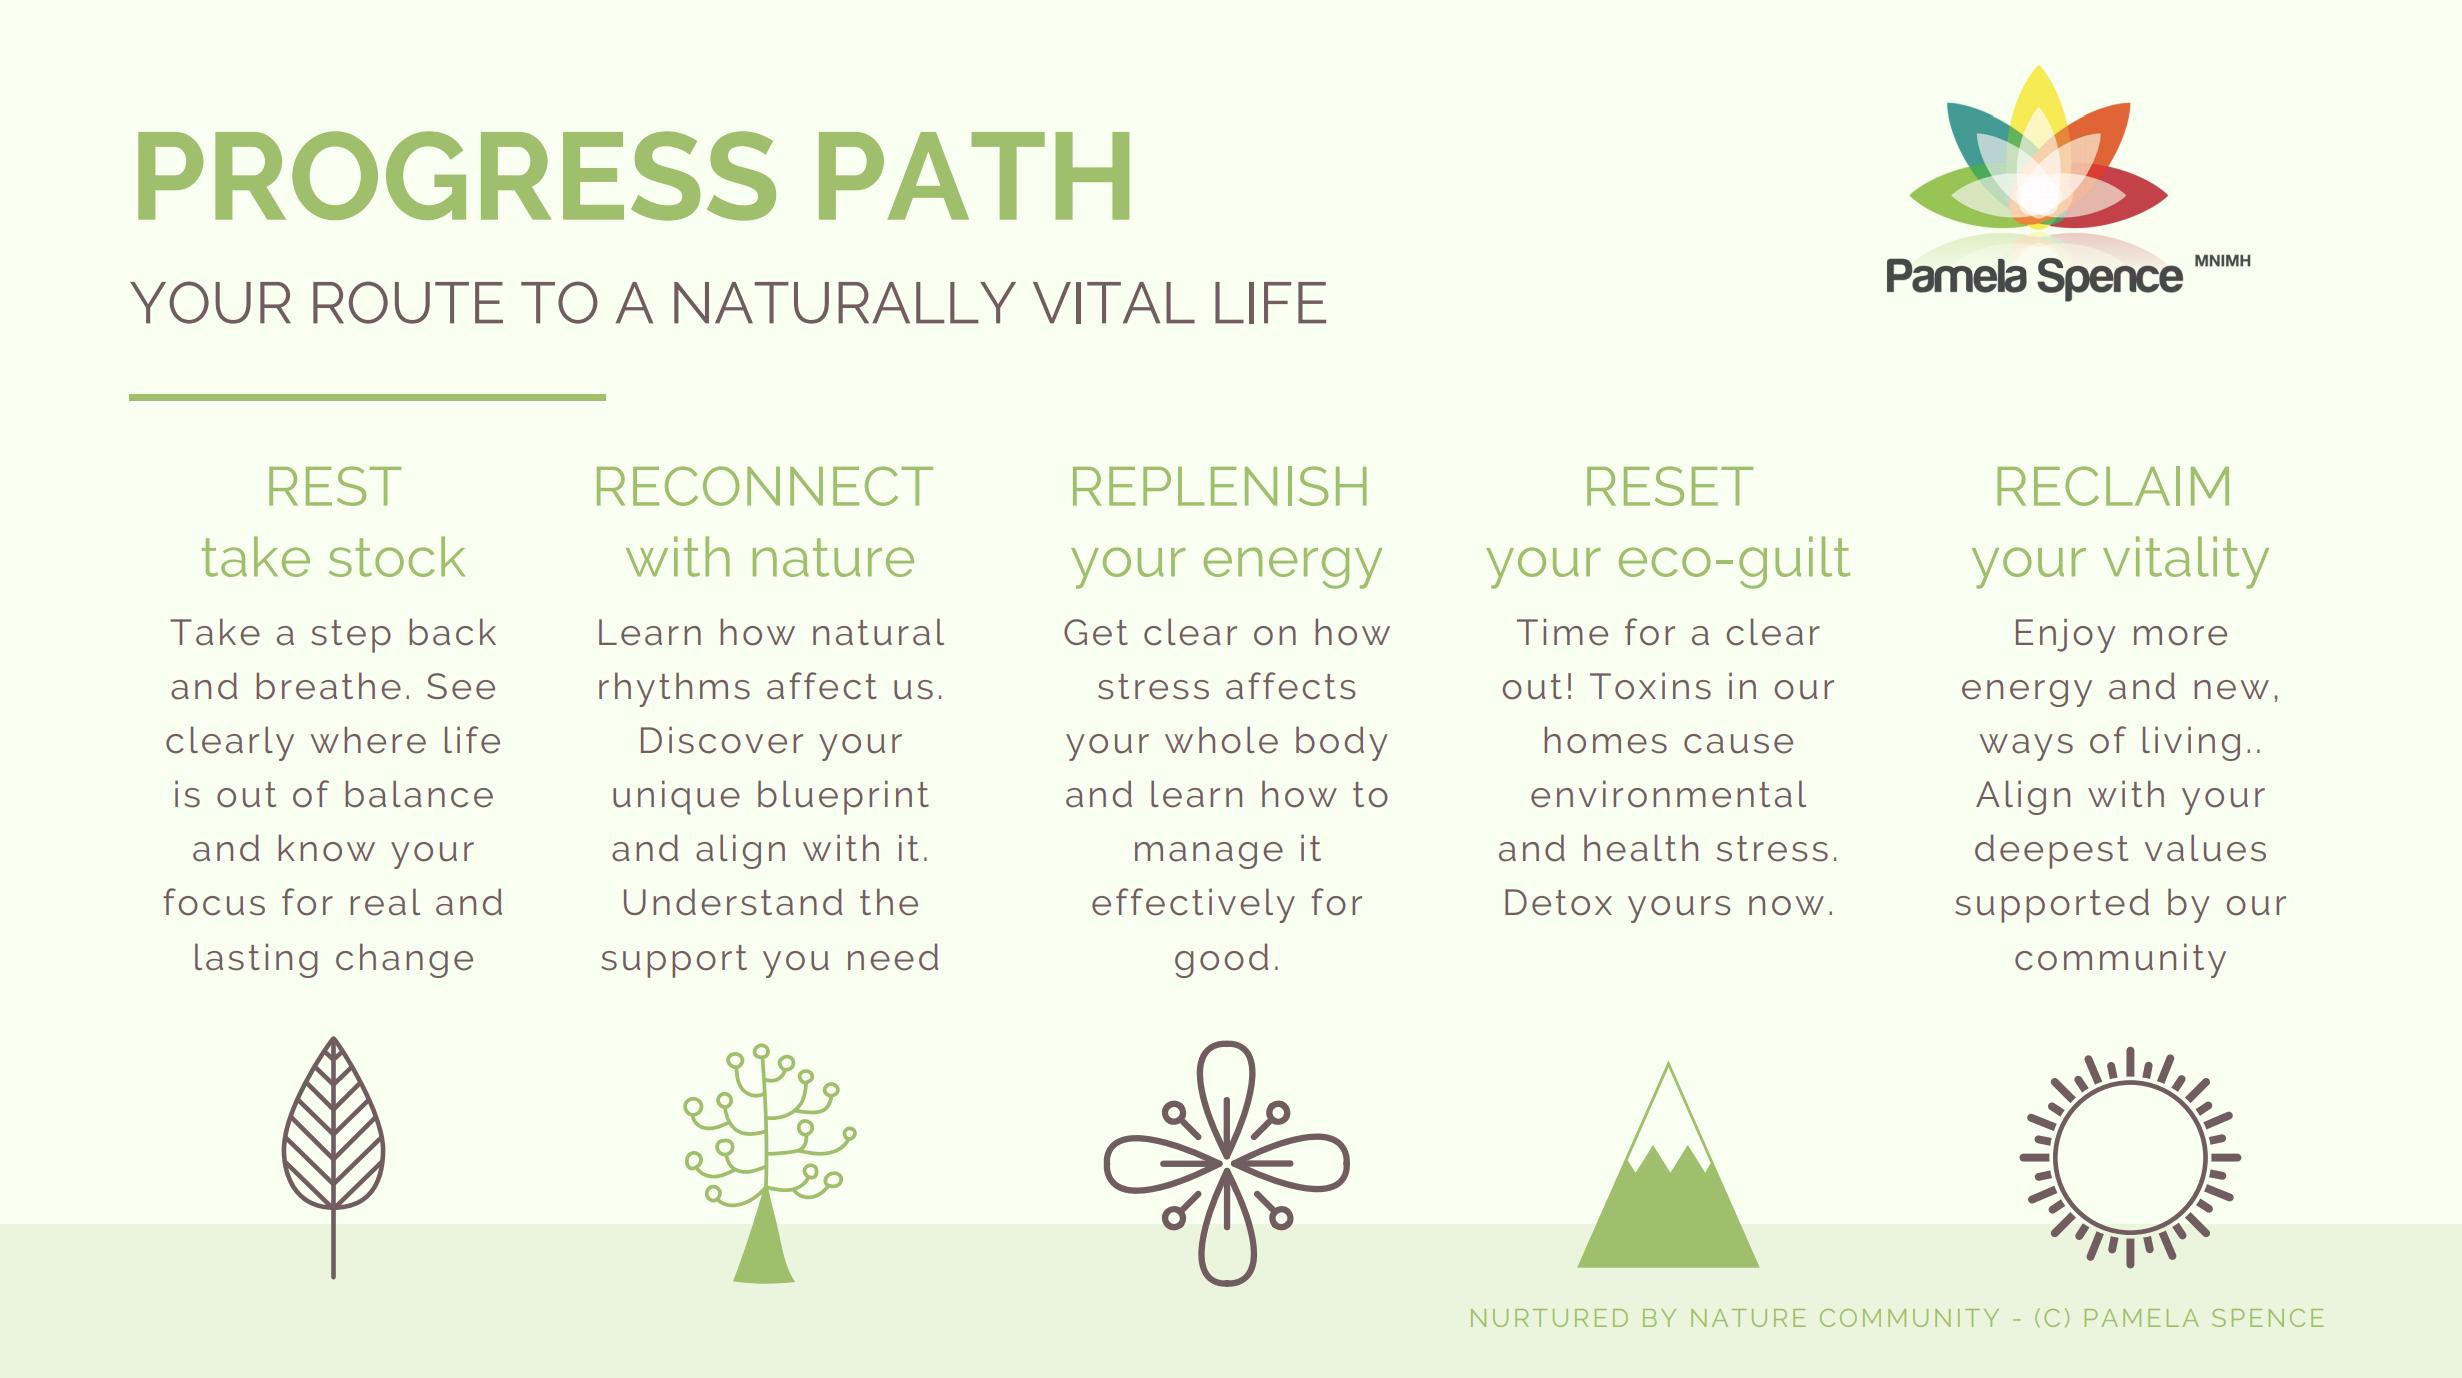 Progress Path